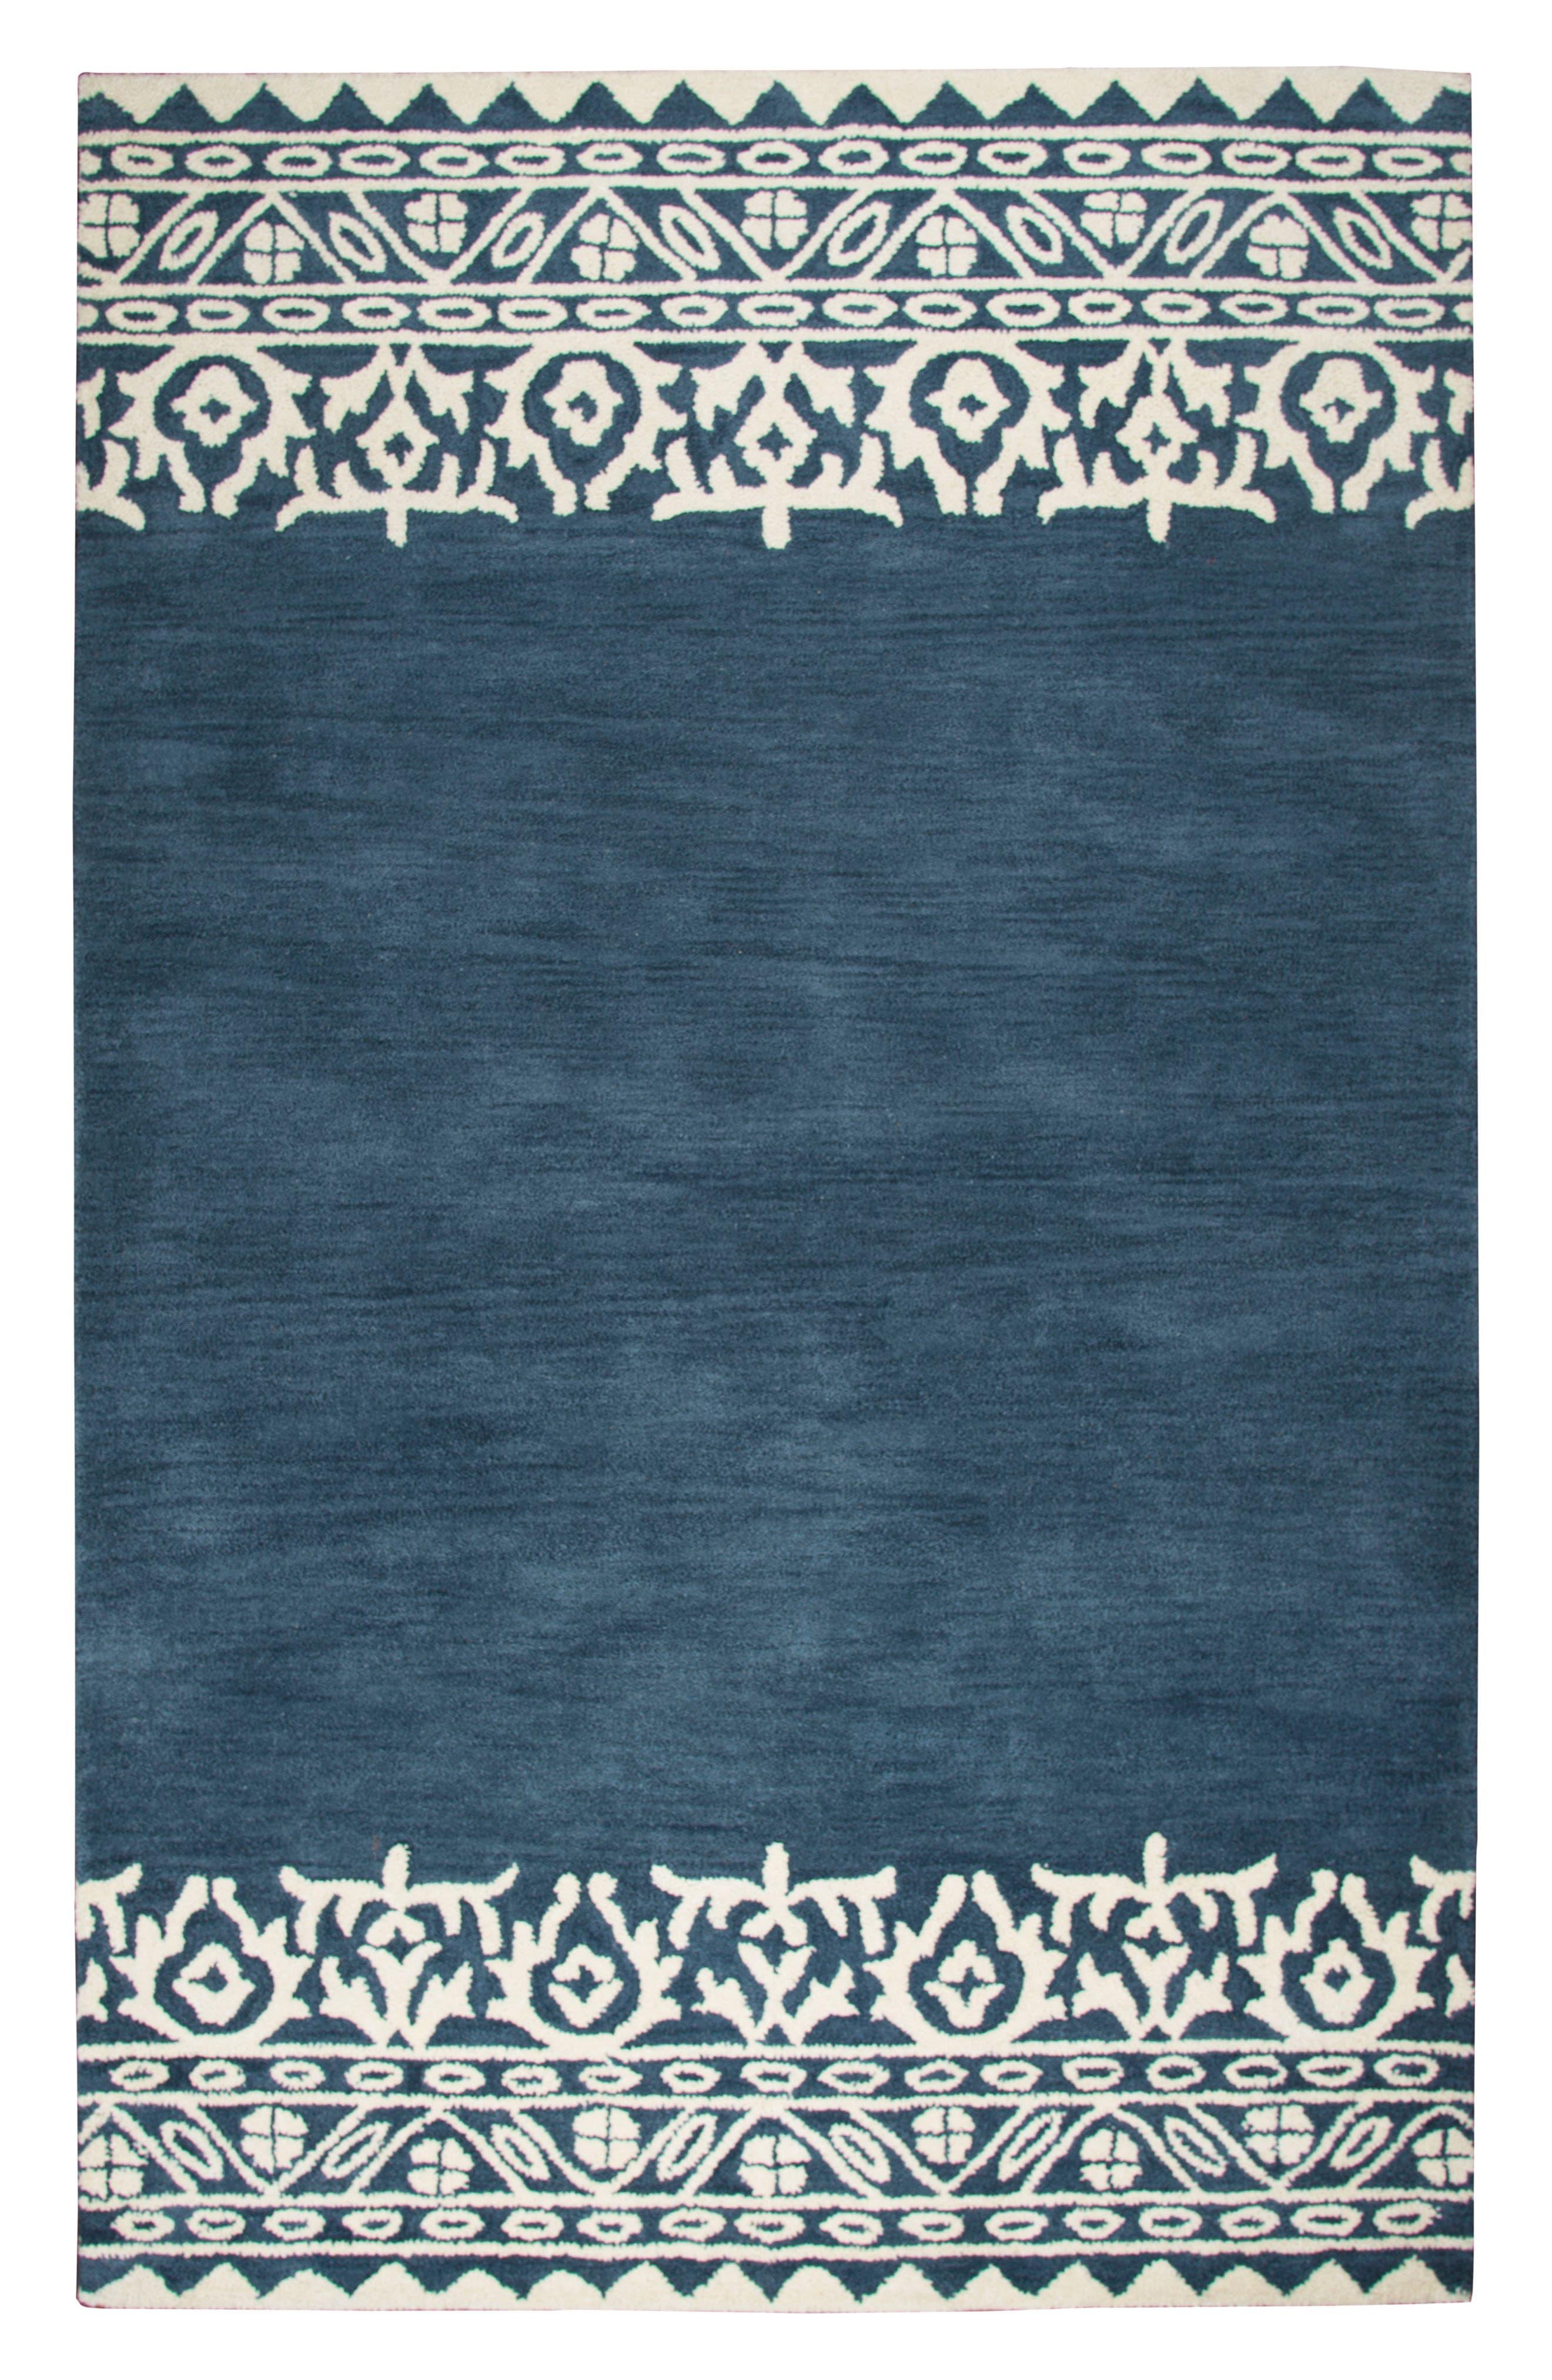 Framed Medallion Hand Tufted Wool Area Rug,                             Main thumbnail 1, color,                             400